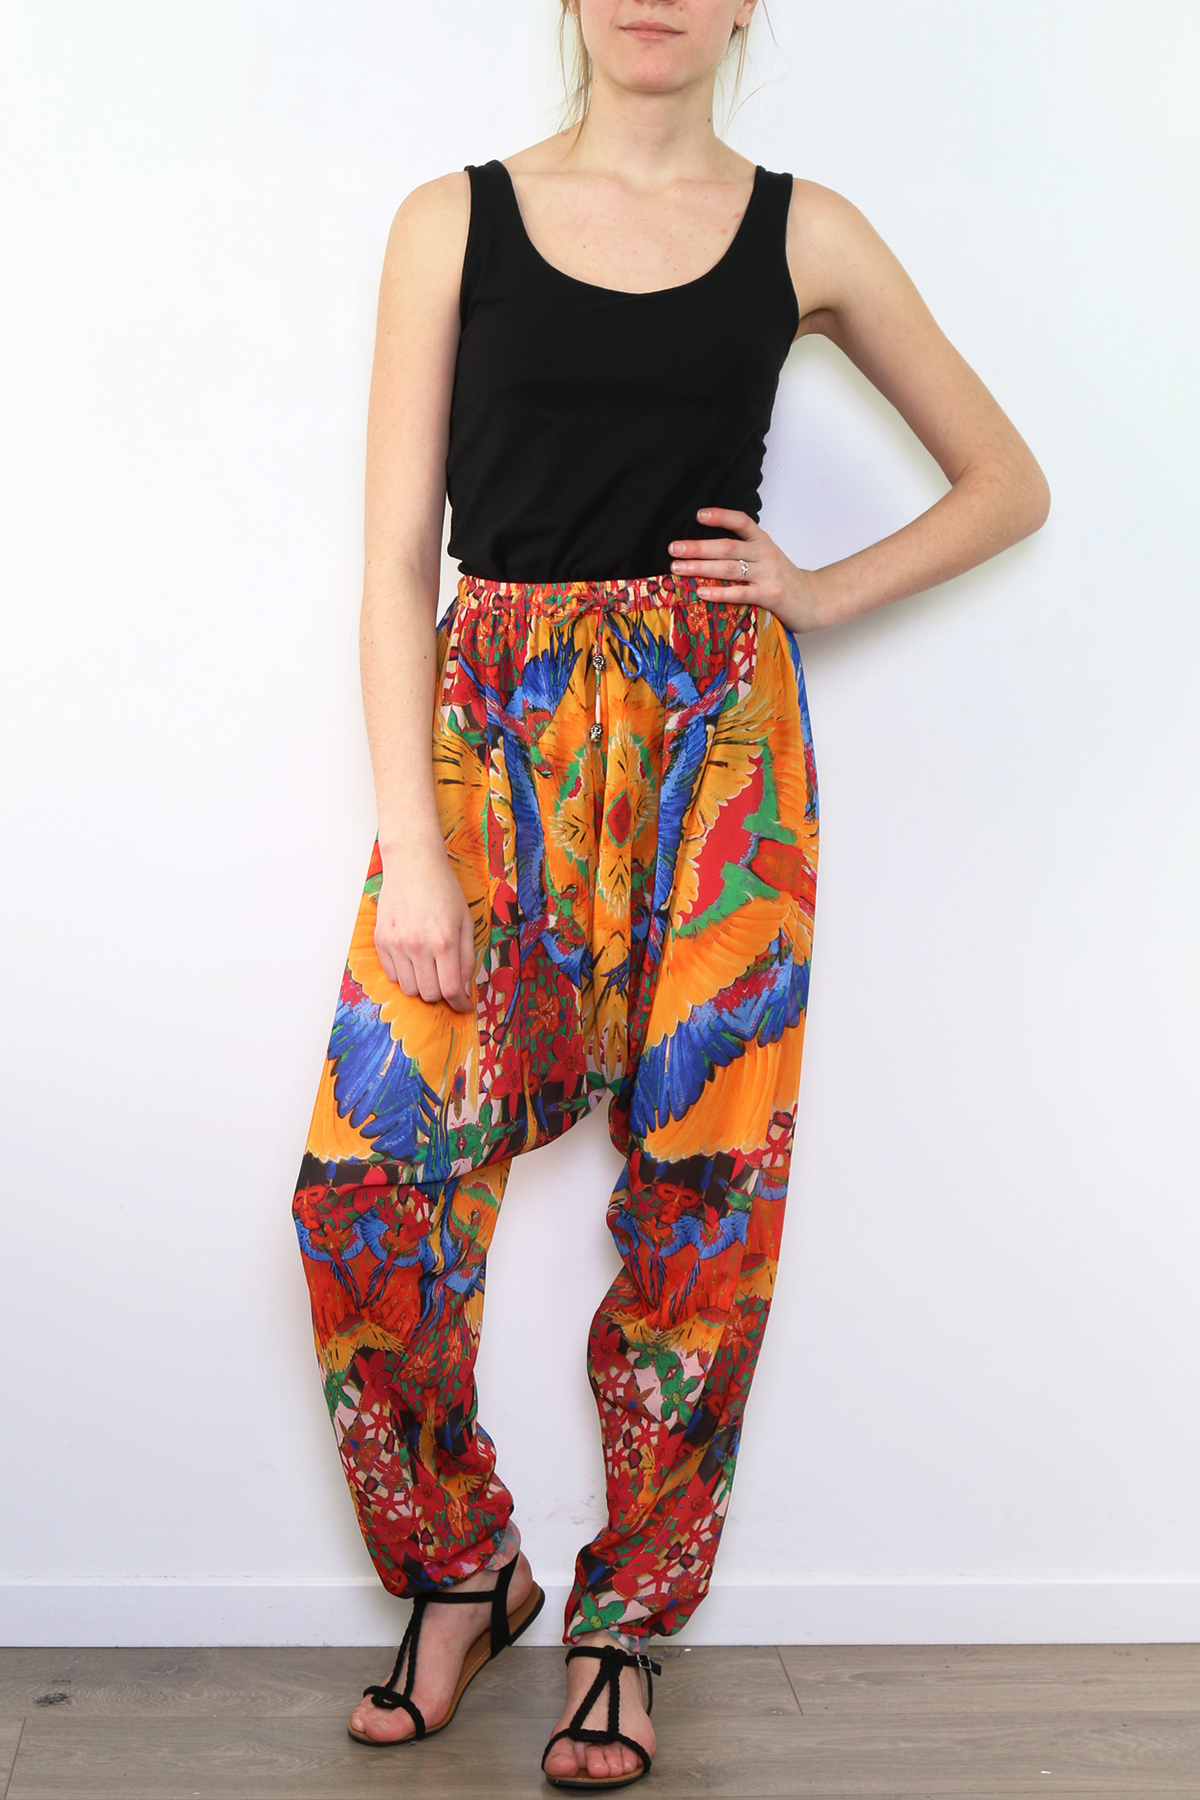 Pantalons Femme Jaune FRIME 786 #c eFashion Paris